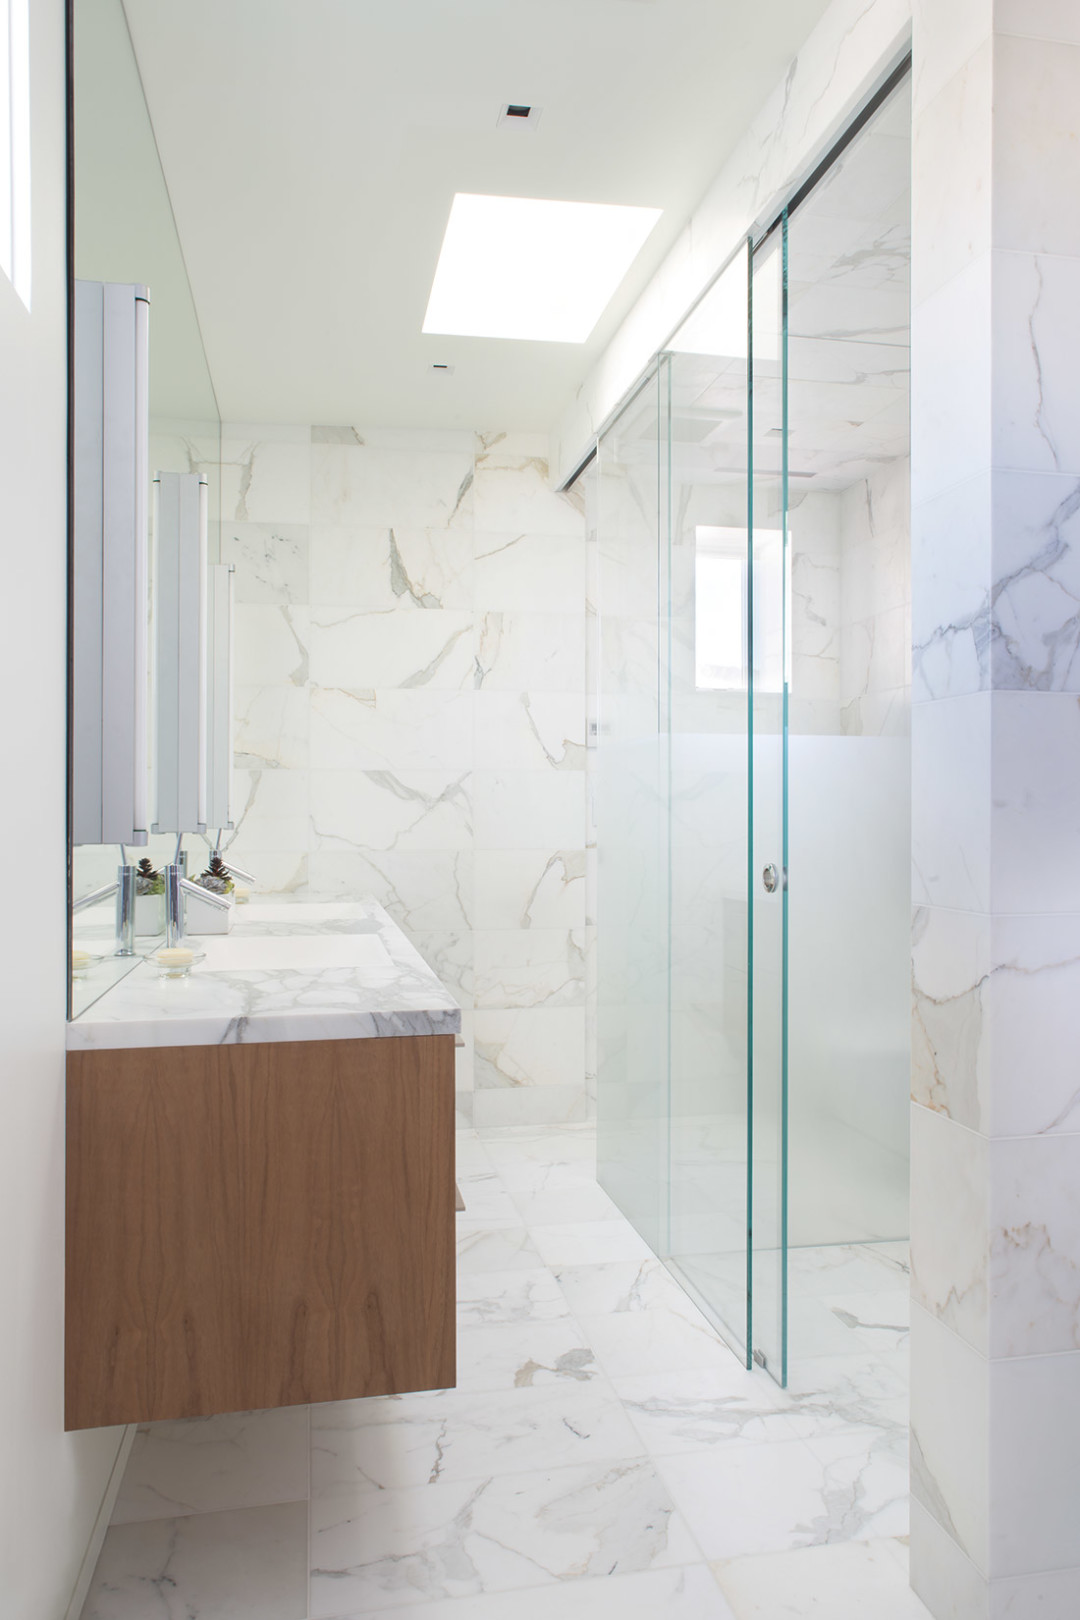 0215 redesign bathroom mb4xzr